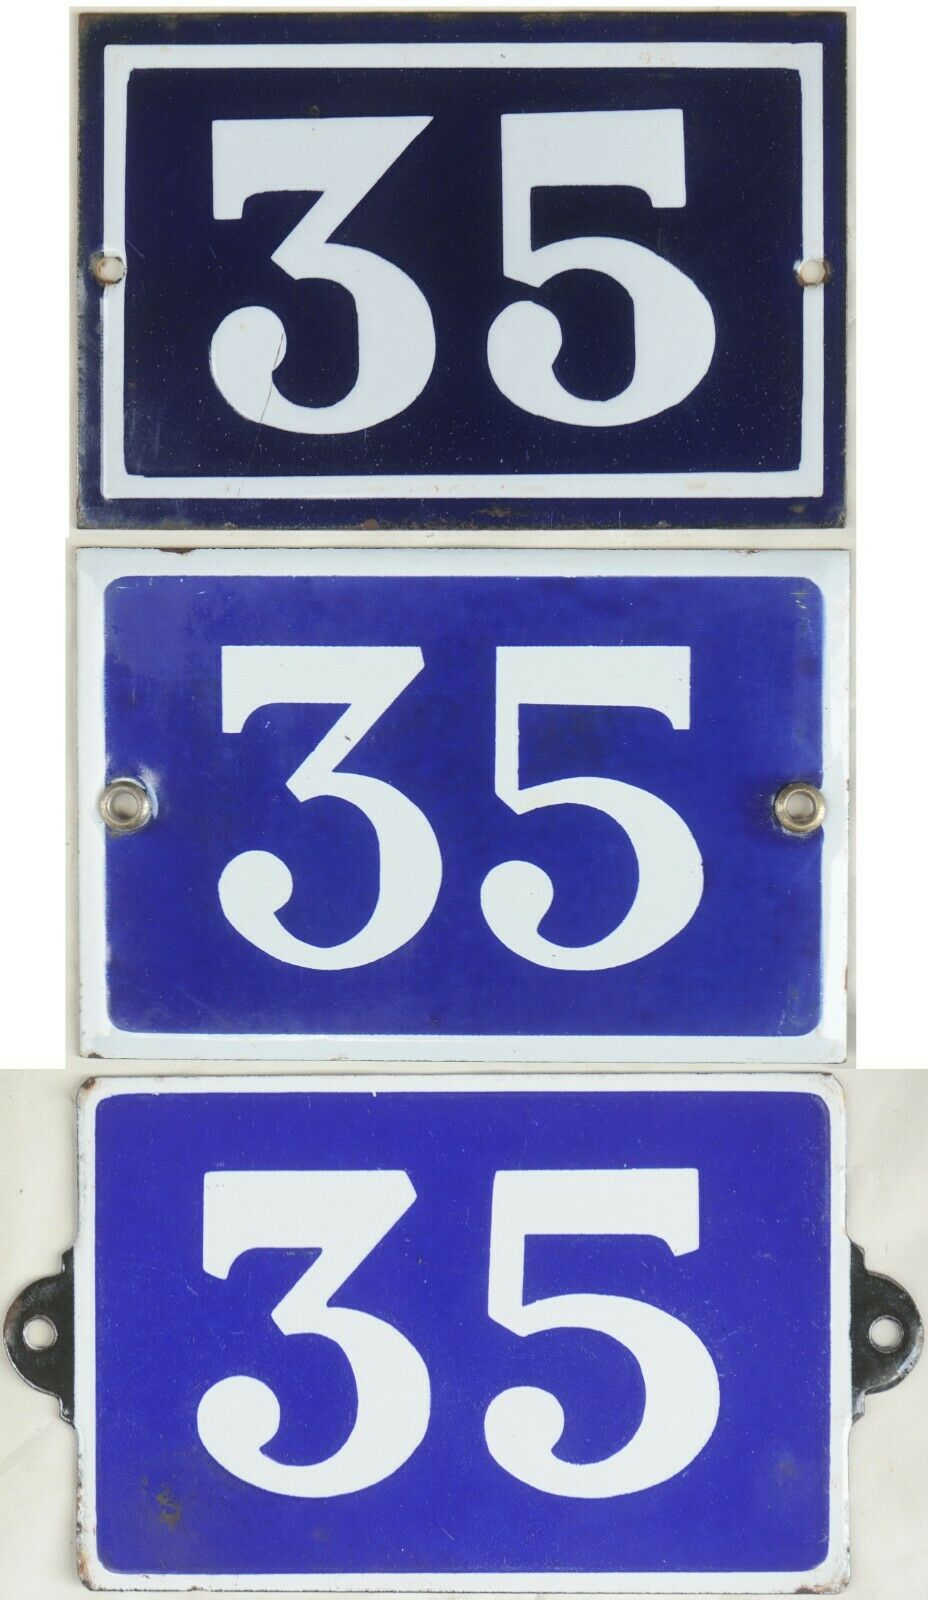 Old Blau French house number 35 door gate plate plaque enamel steel metal sign